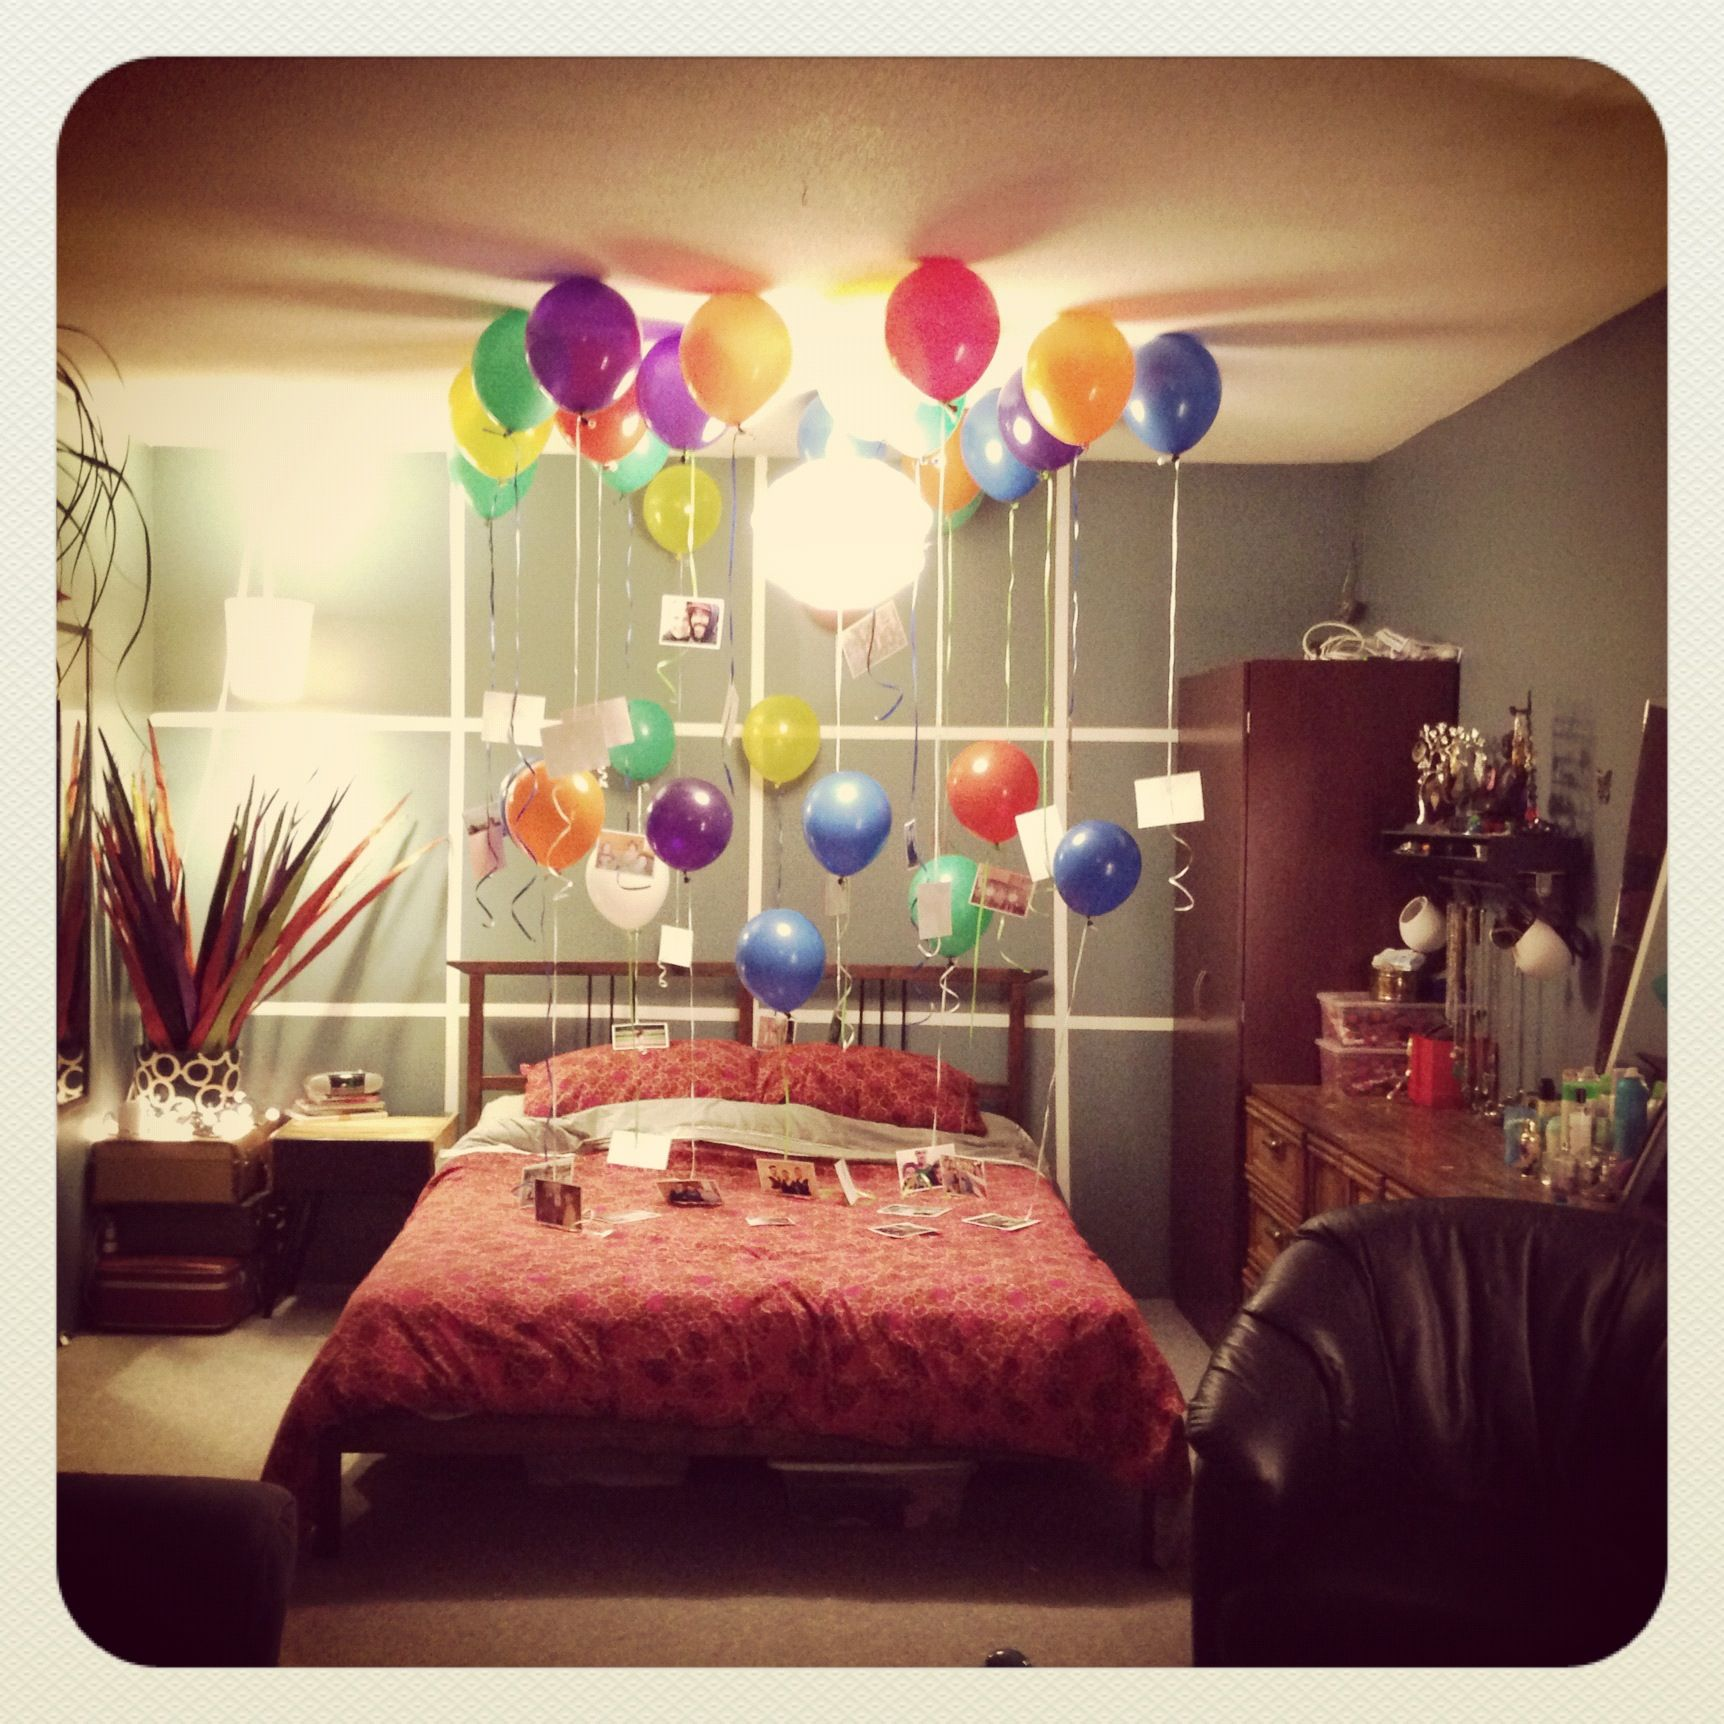 Birthday Surprise For The Boyfriend Birthday Room Decorations